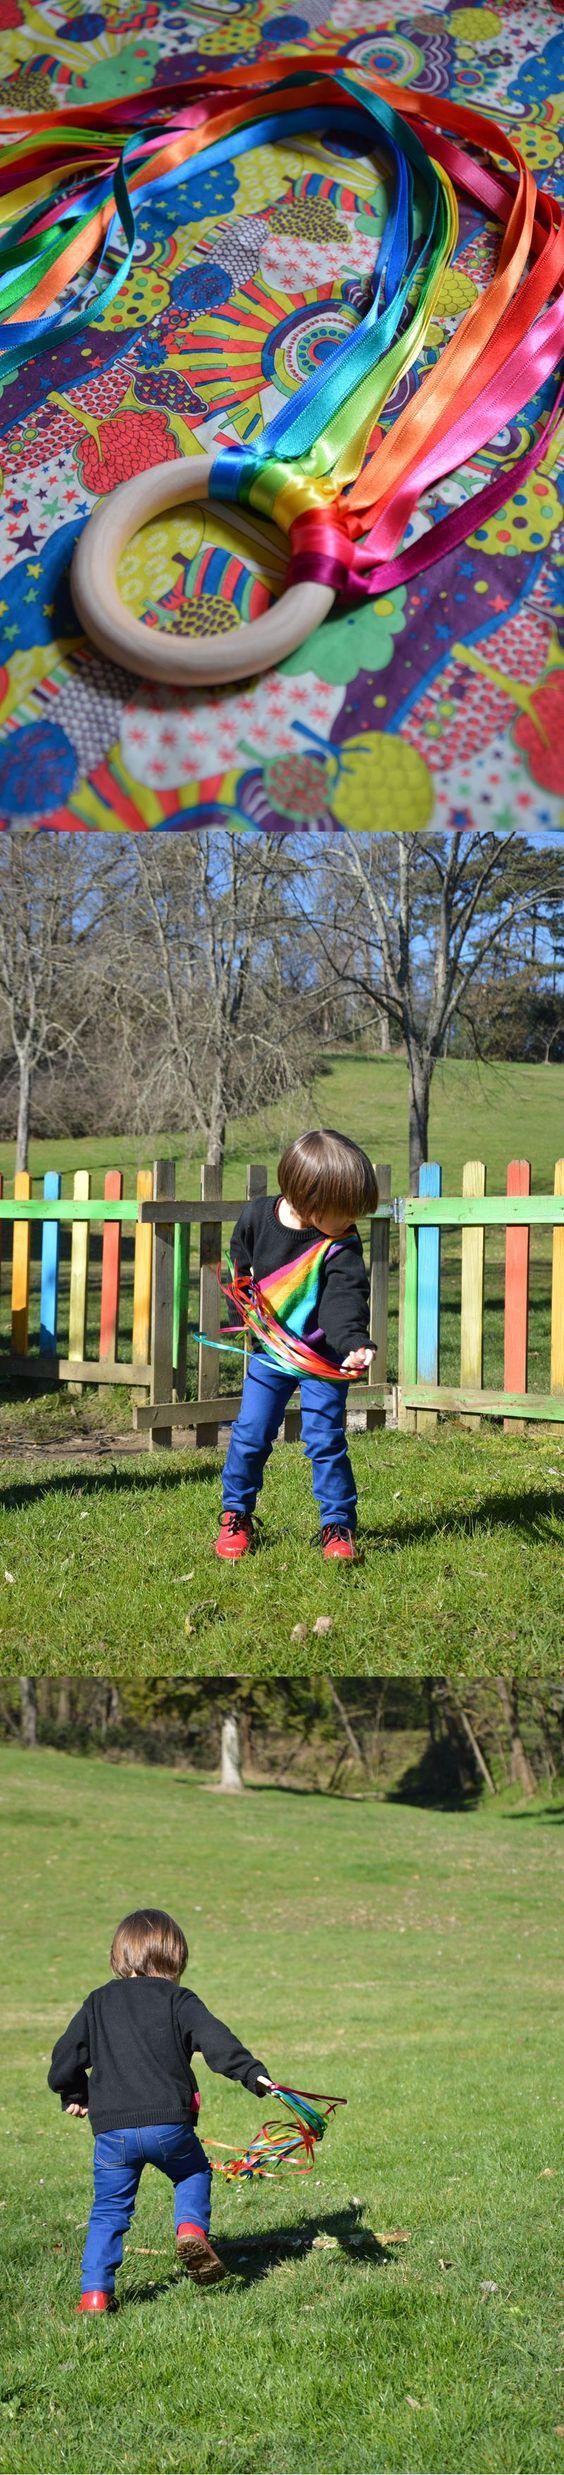 Rainbow week day 3 : Youpi mercredi #33 le cerf volant de main (concours inside) « Blisscocotte